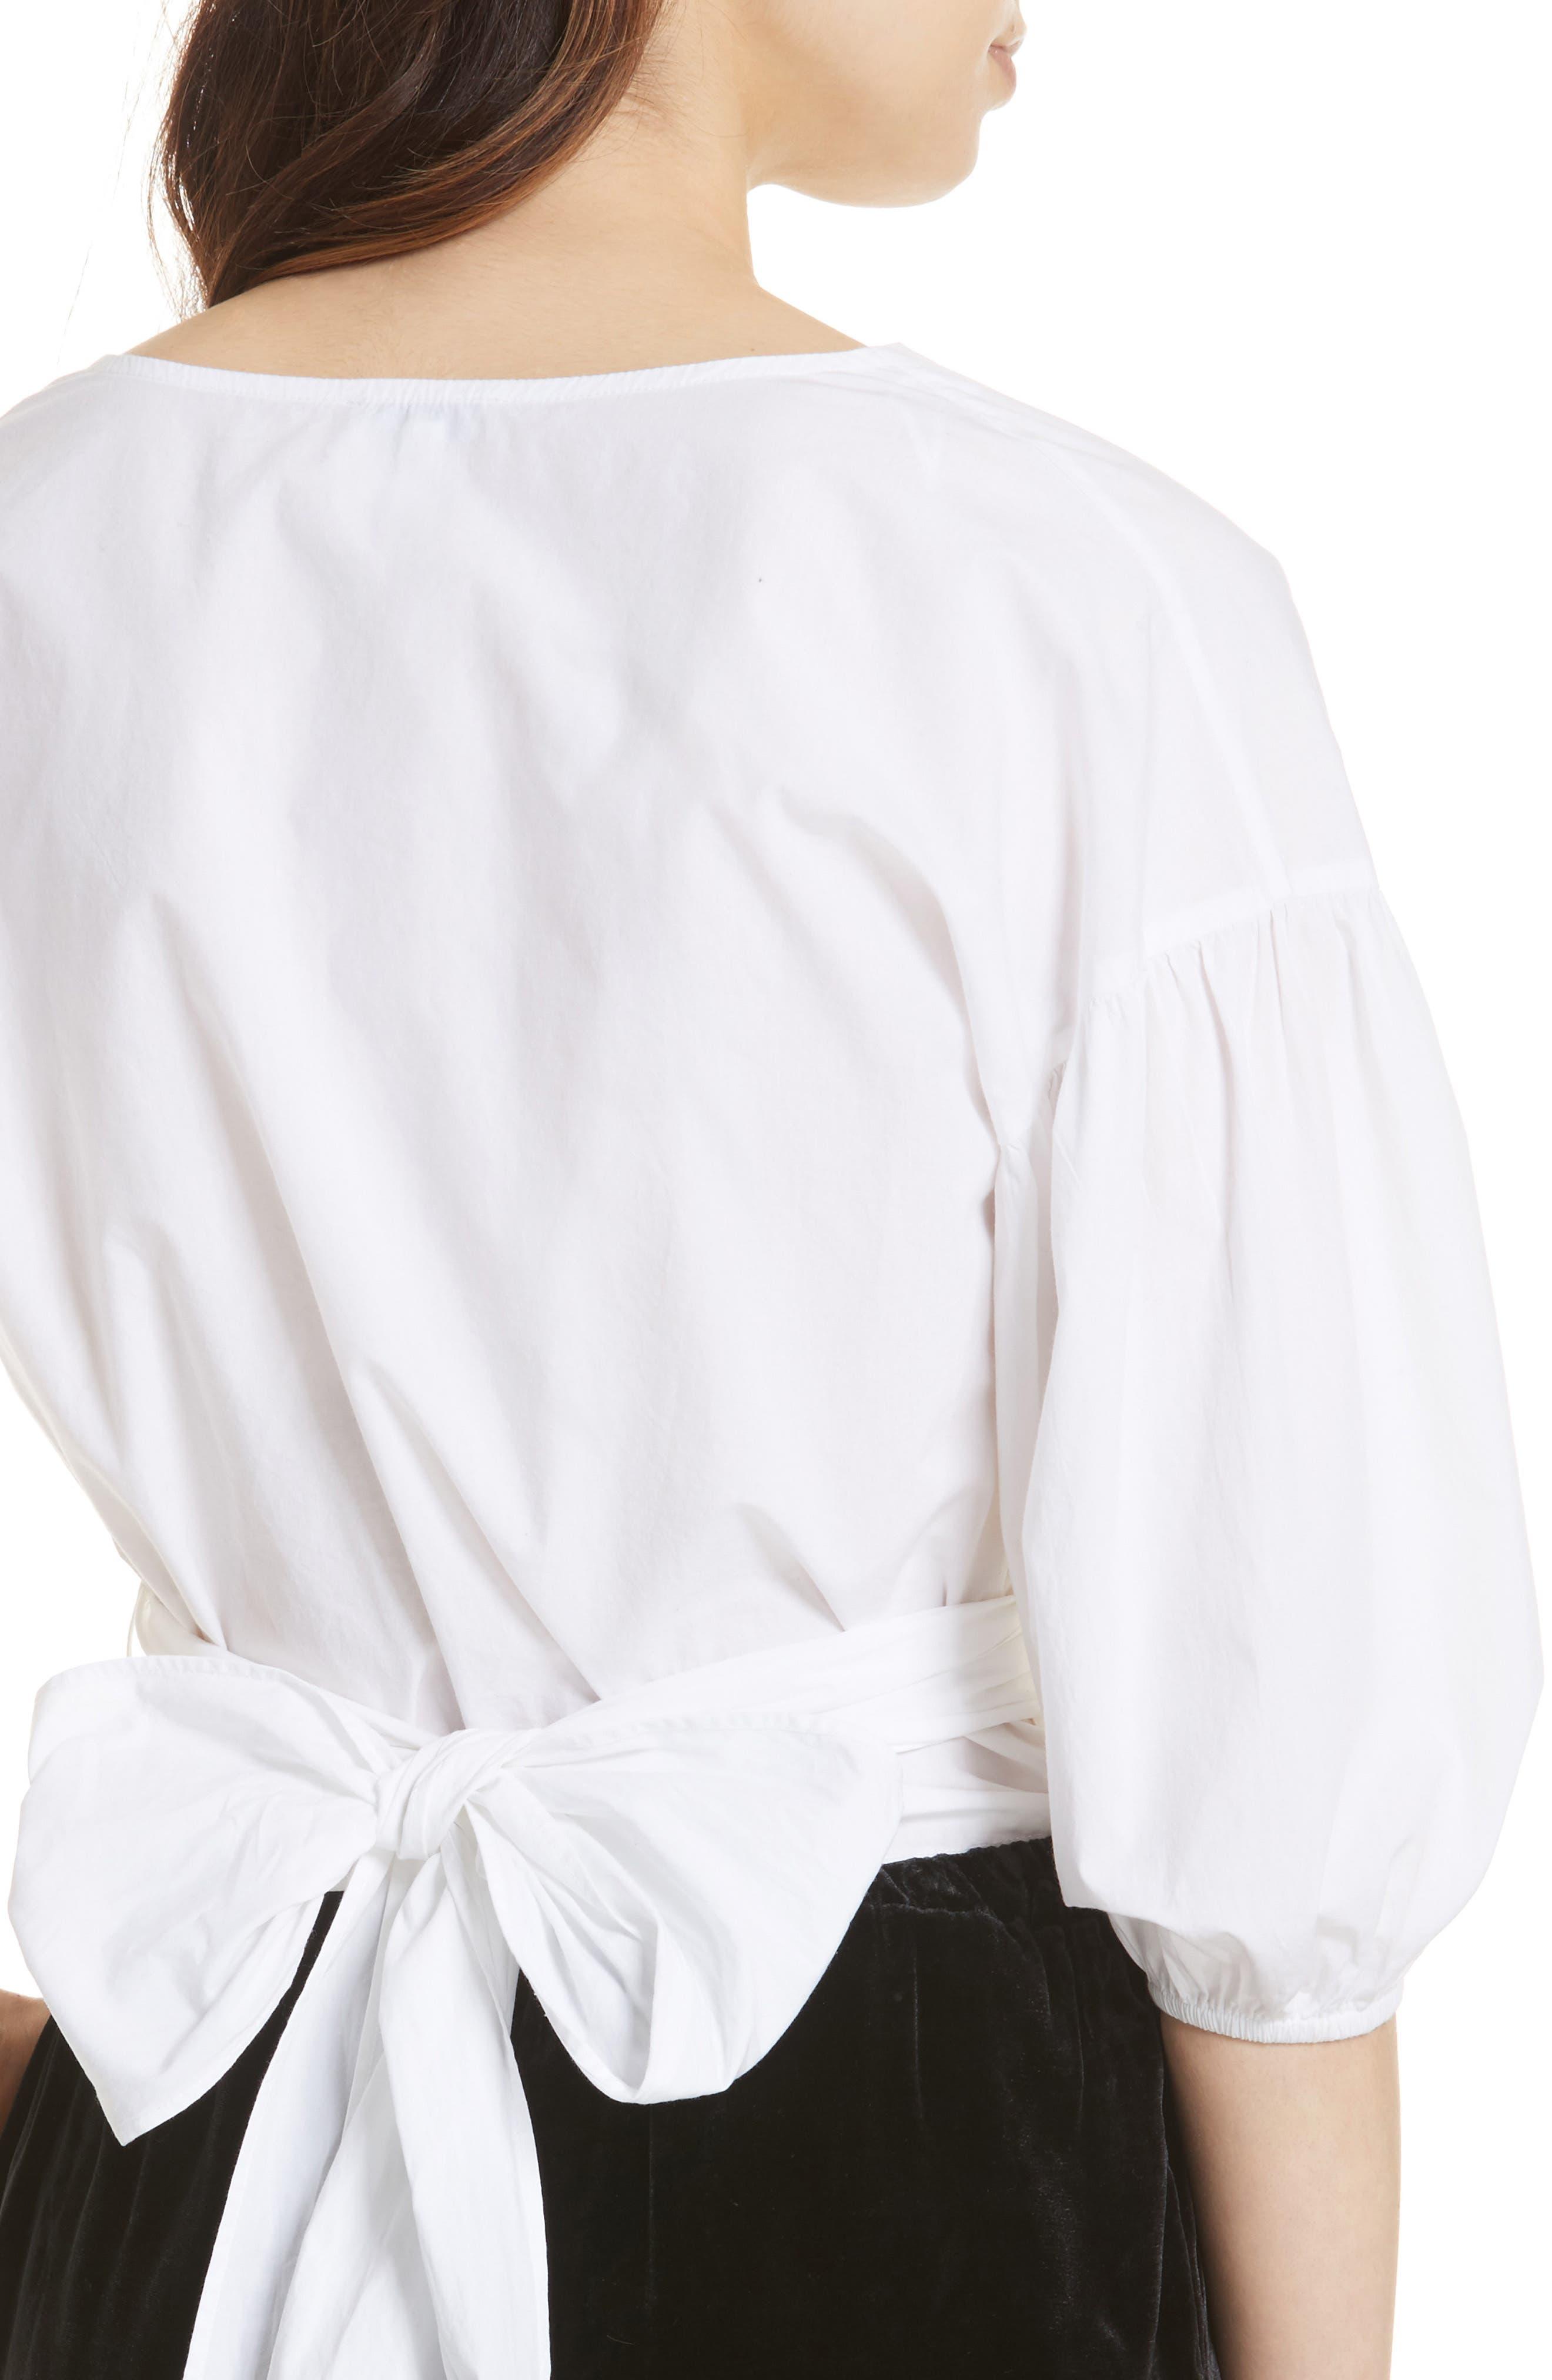 Hausu Bow Back Blouse,                             Alternate thumbnail 4, color,                             Clean White